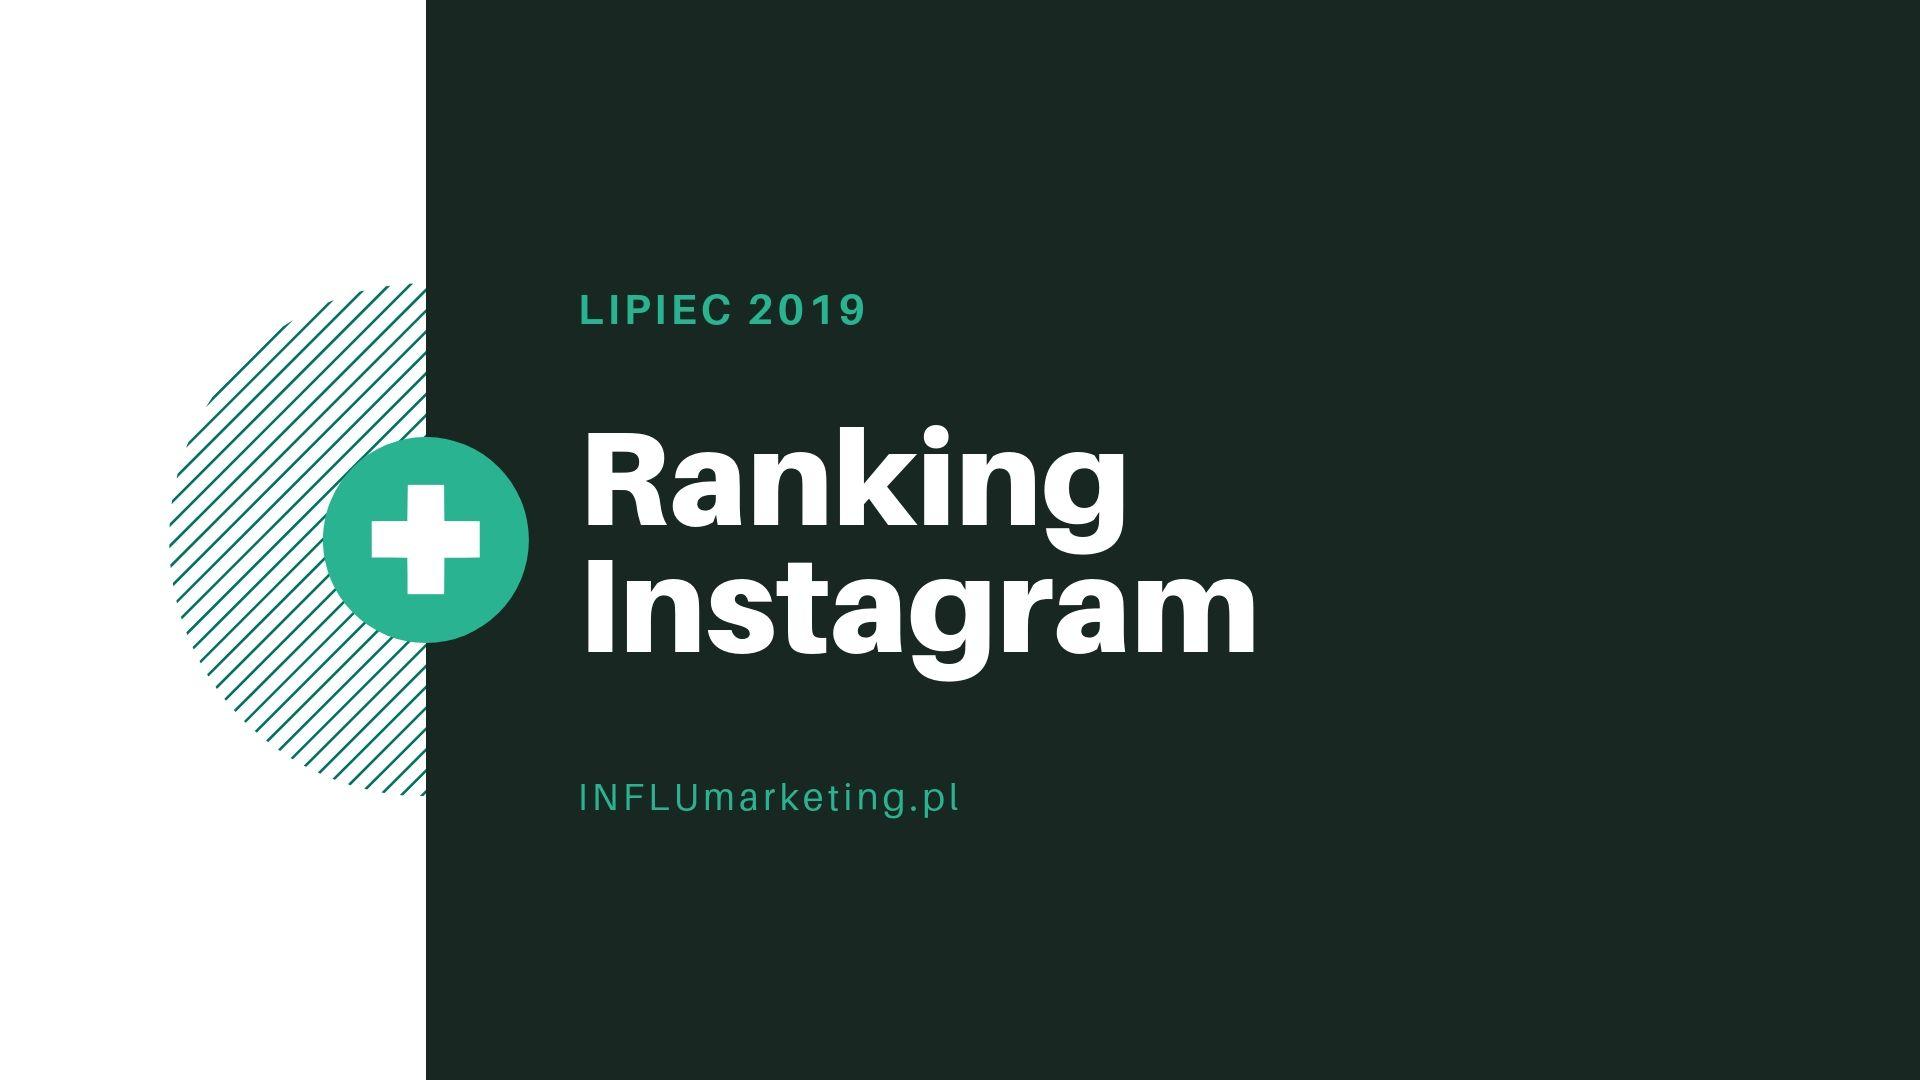 Ranking Instagram Polska - Lipiec 2019